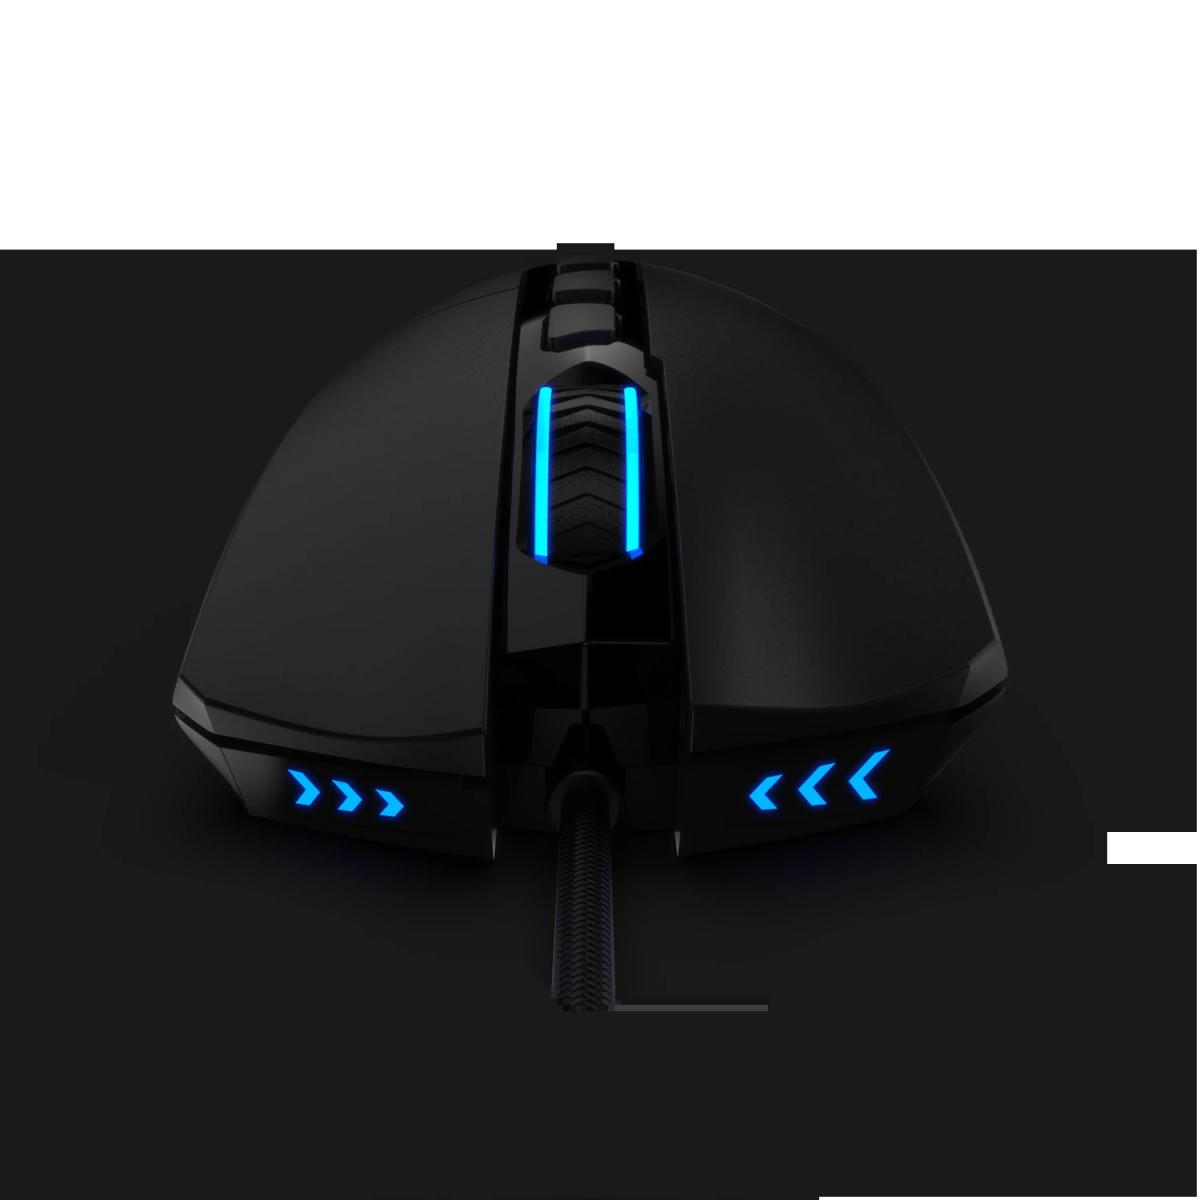 Mouse Gamer Redragon Lonewolf 2 Pro M721 RGB, 32000 DPI, 10 Botões Programáveis, Black